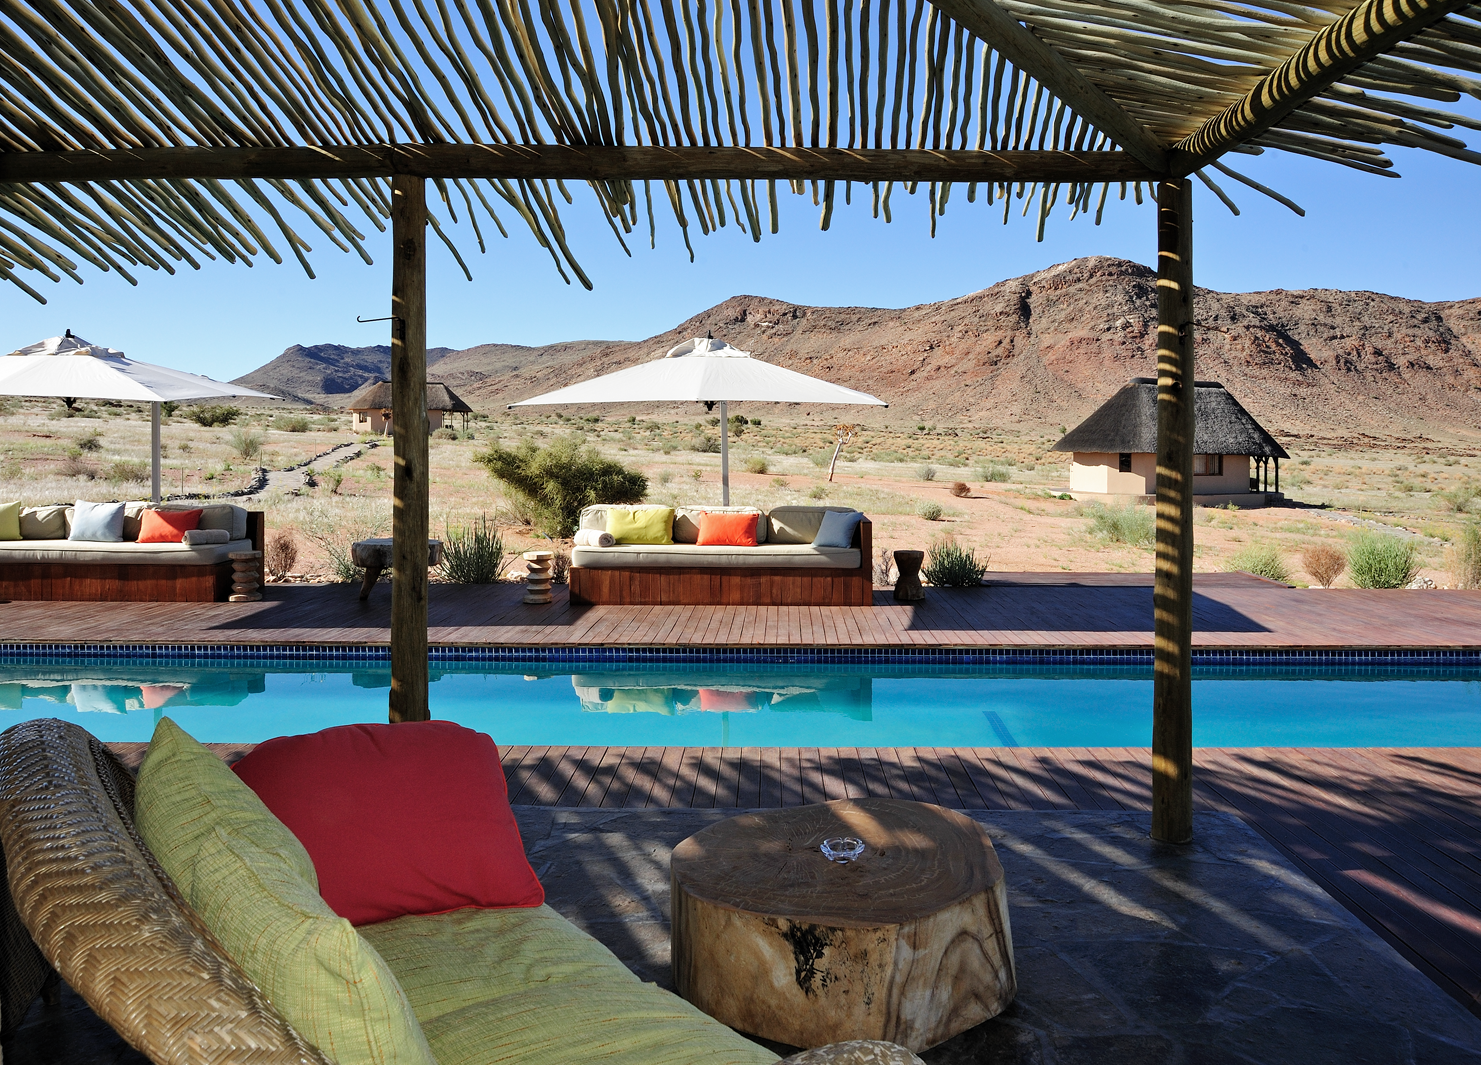 069 Sandfontein Lodge.tif